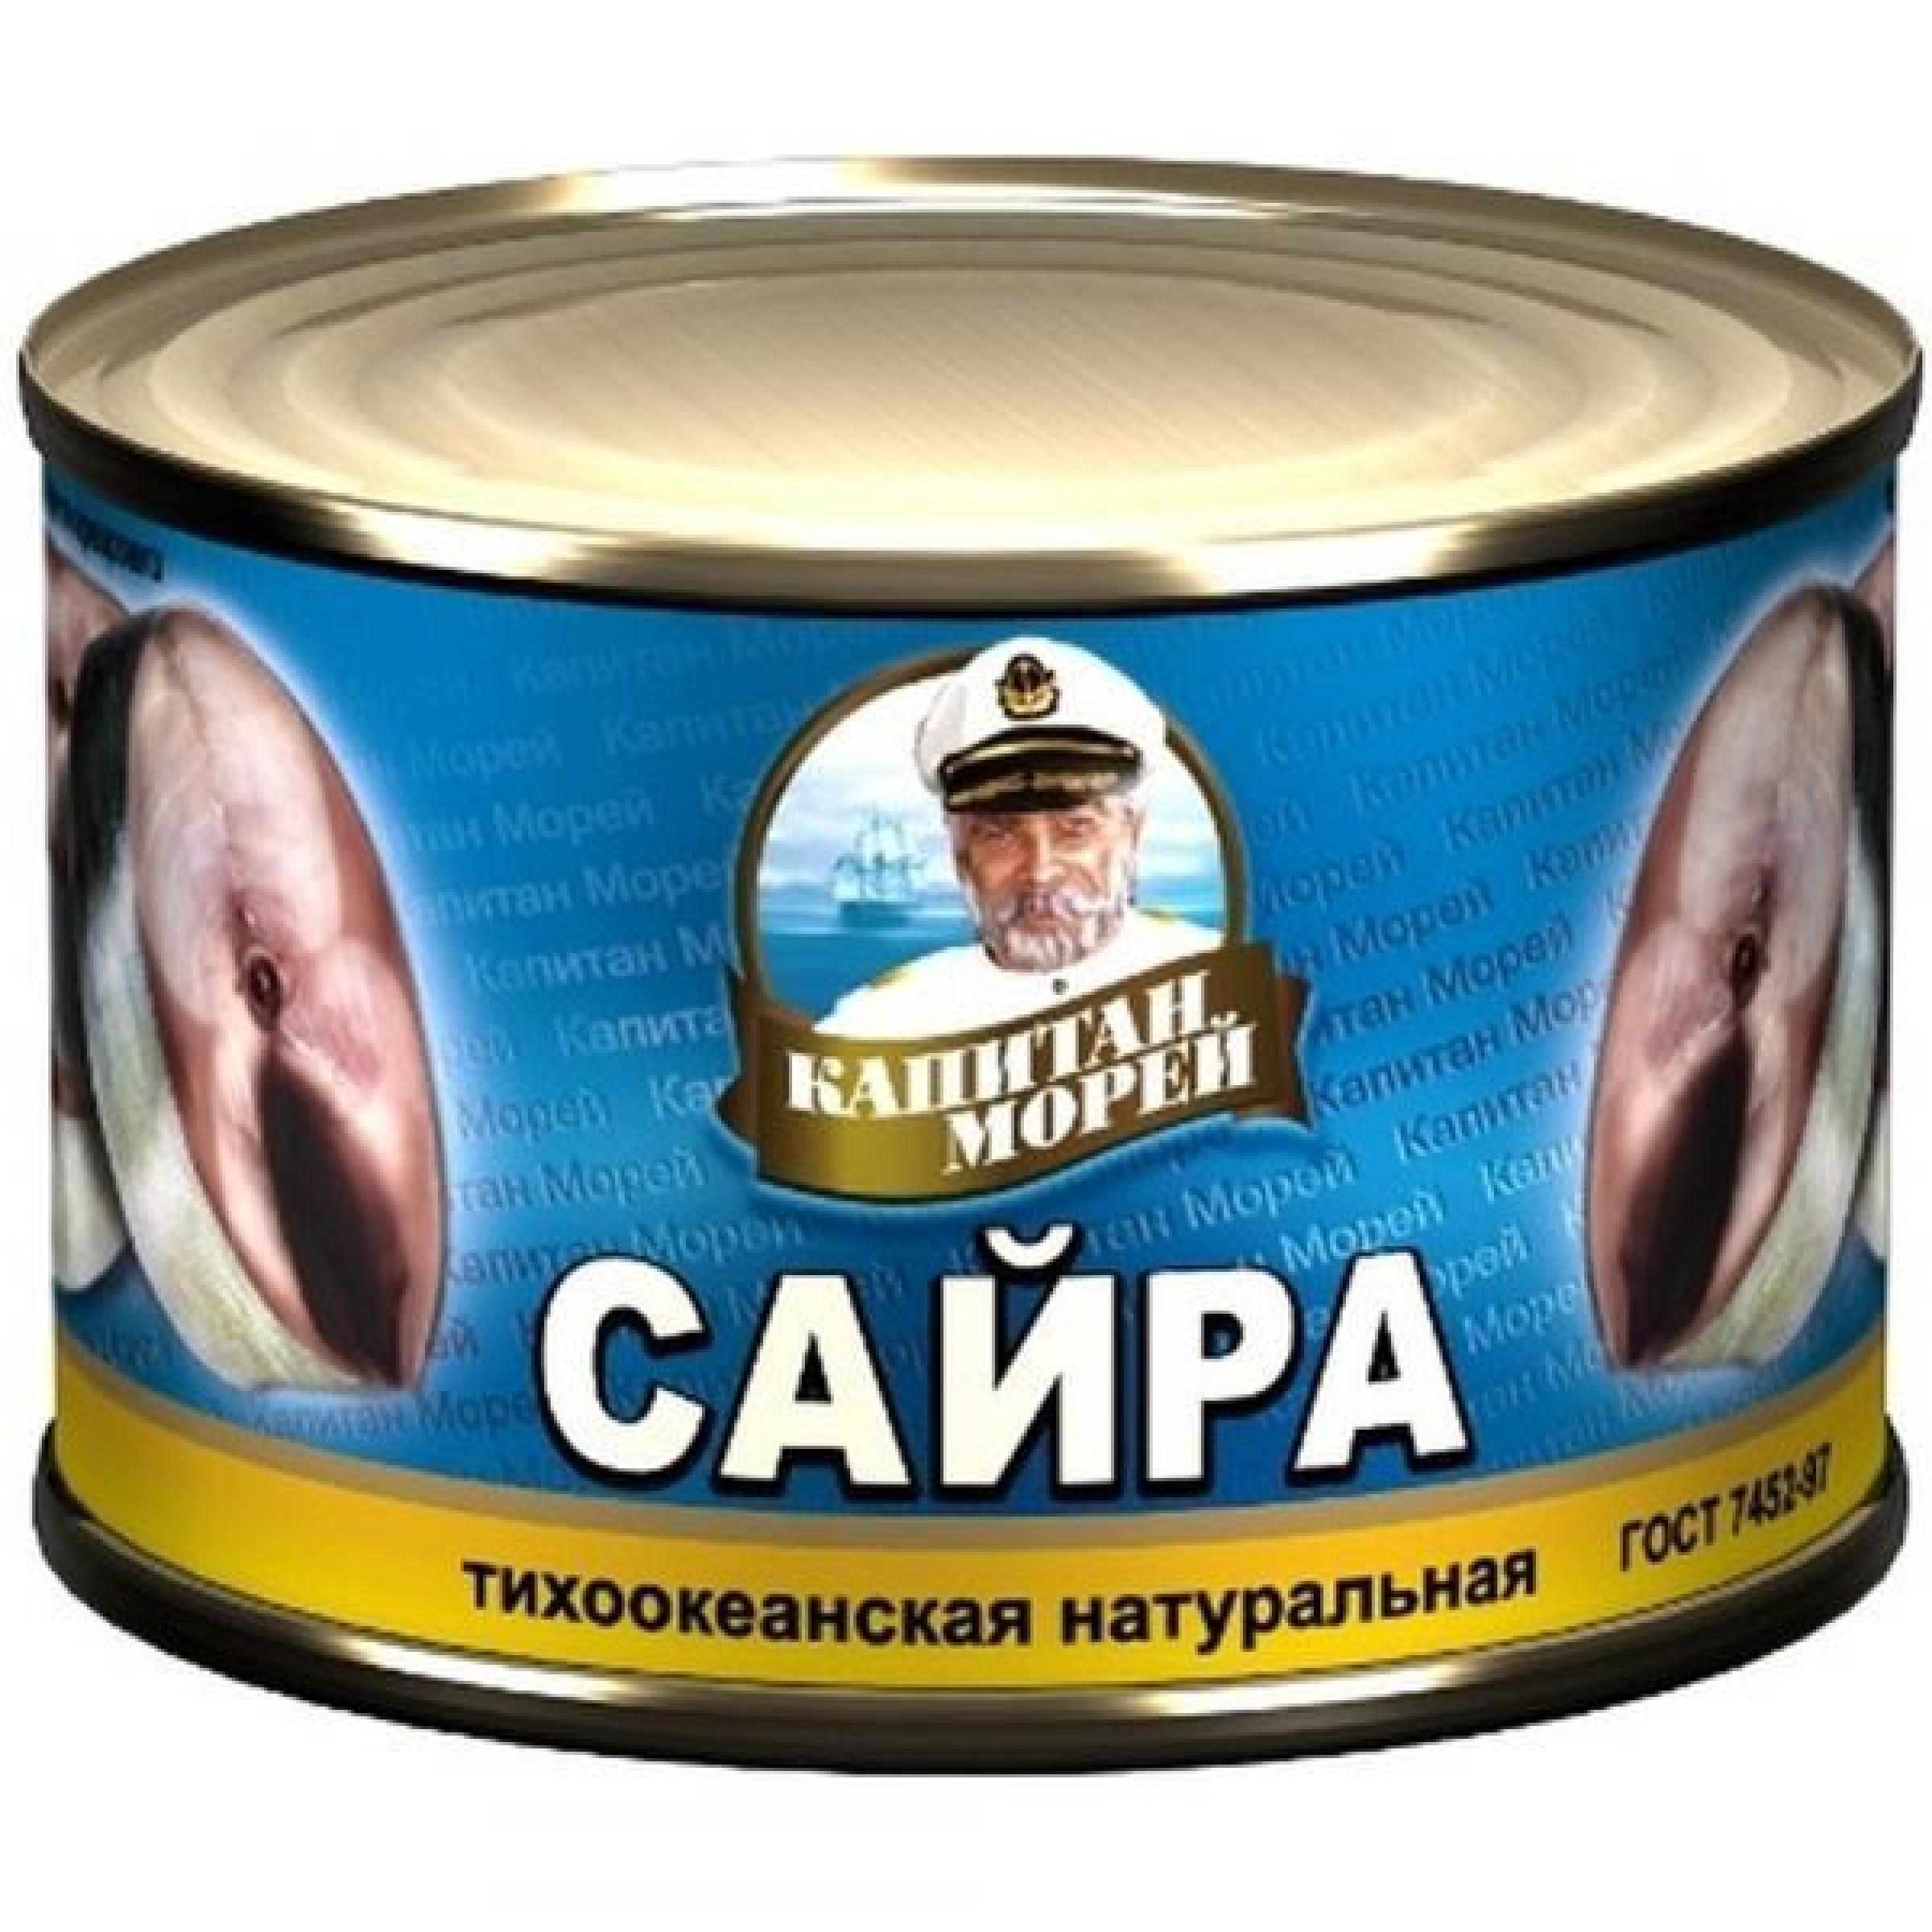 Сайра натуральная №6 Капитан морей, 250 гр